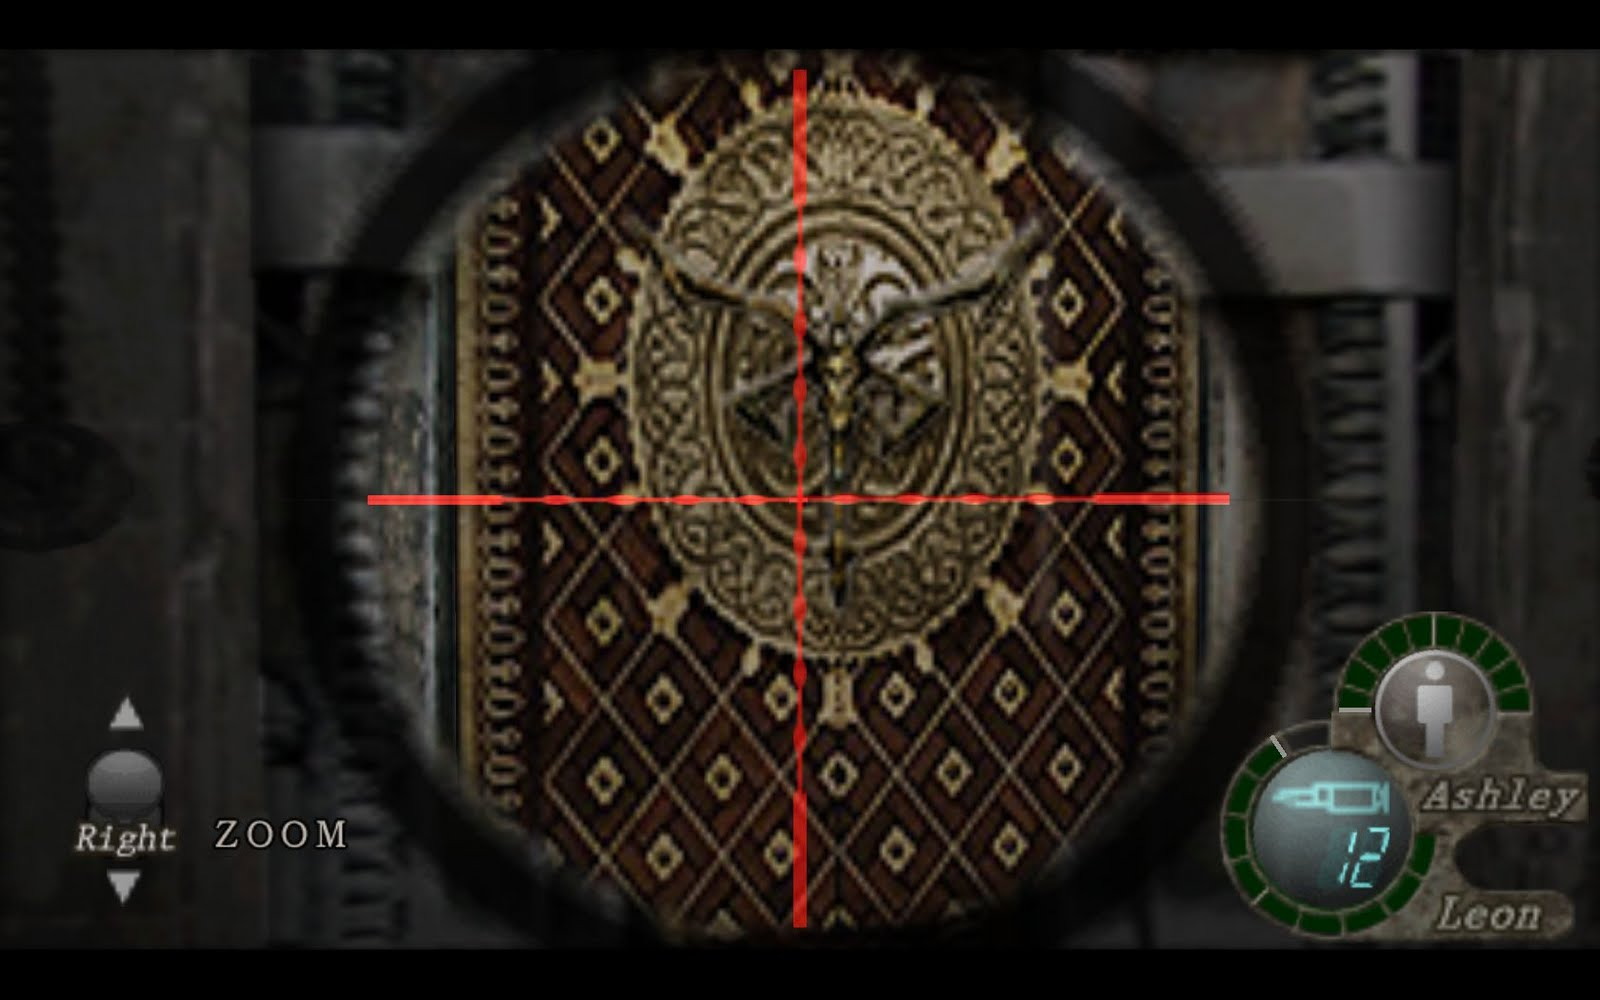 Jurnalis Independen Sejarah Mayday Amp Illuminati